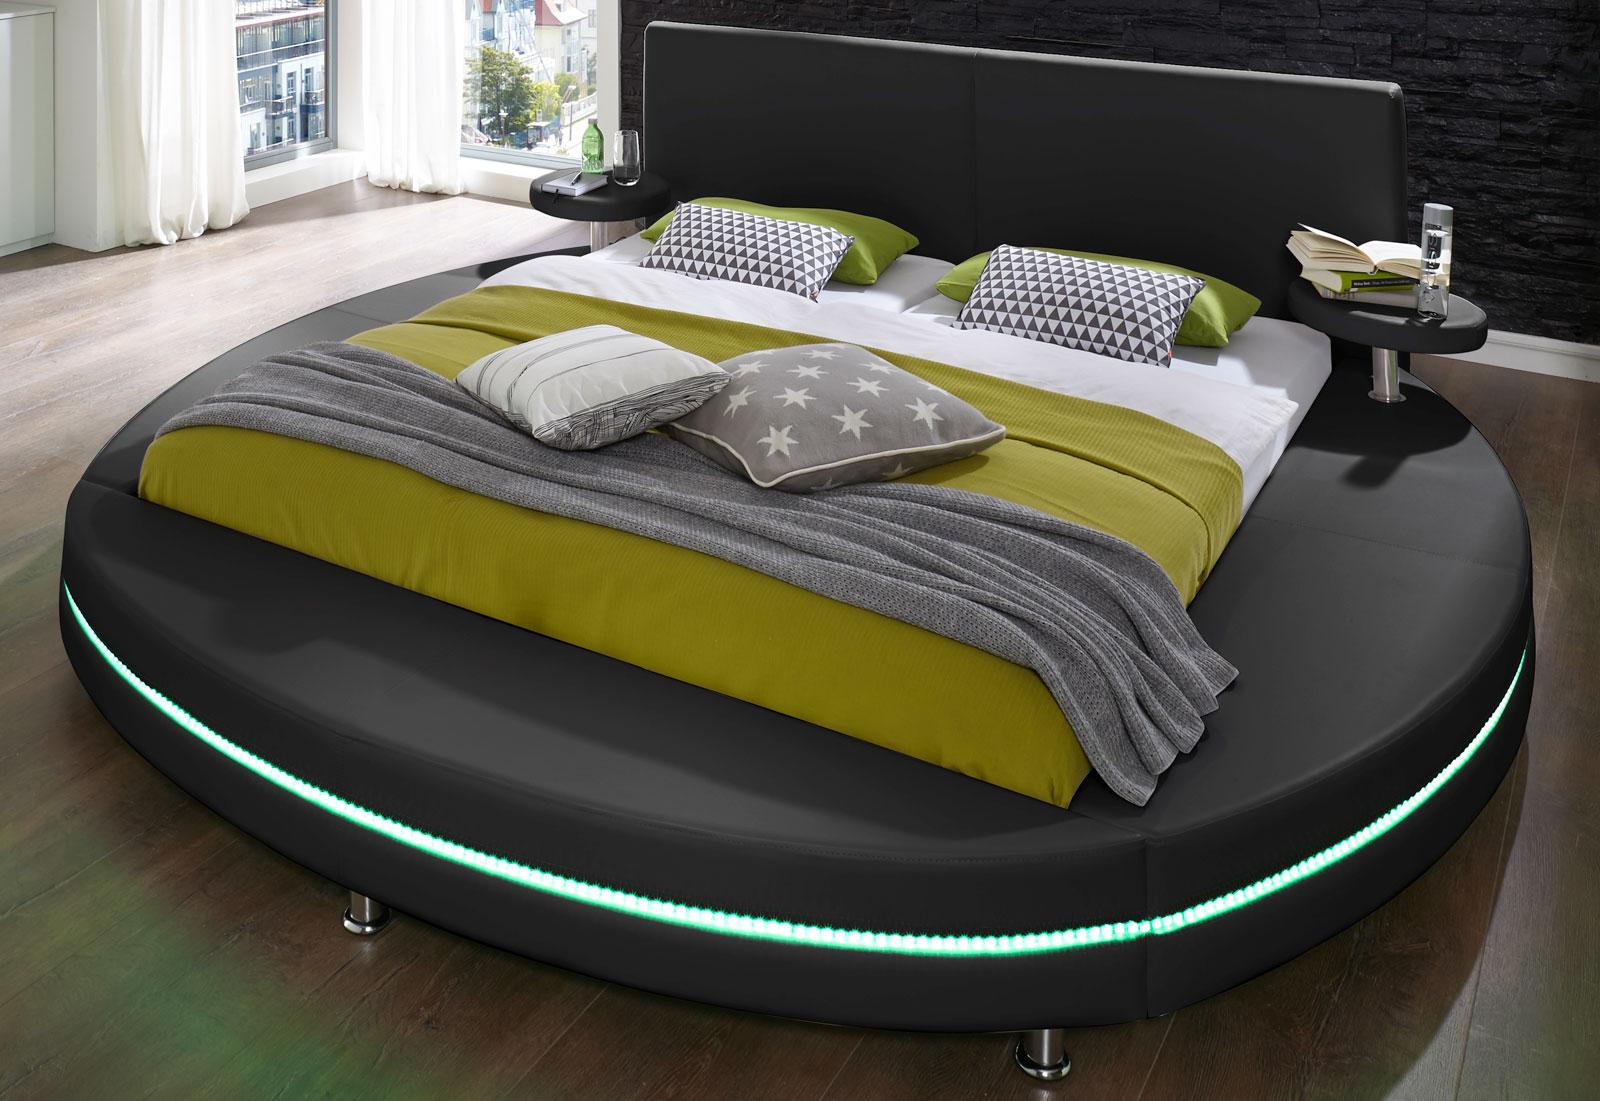 sam rundbett mit led 200 x 200 cm abgesteppt schwarz gallo. Black Bedroom Furniture Sets. Home Design Ideas